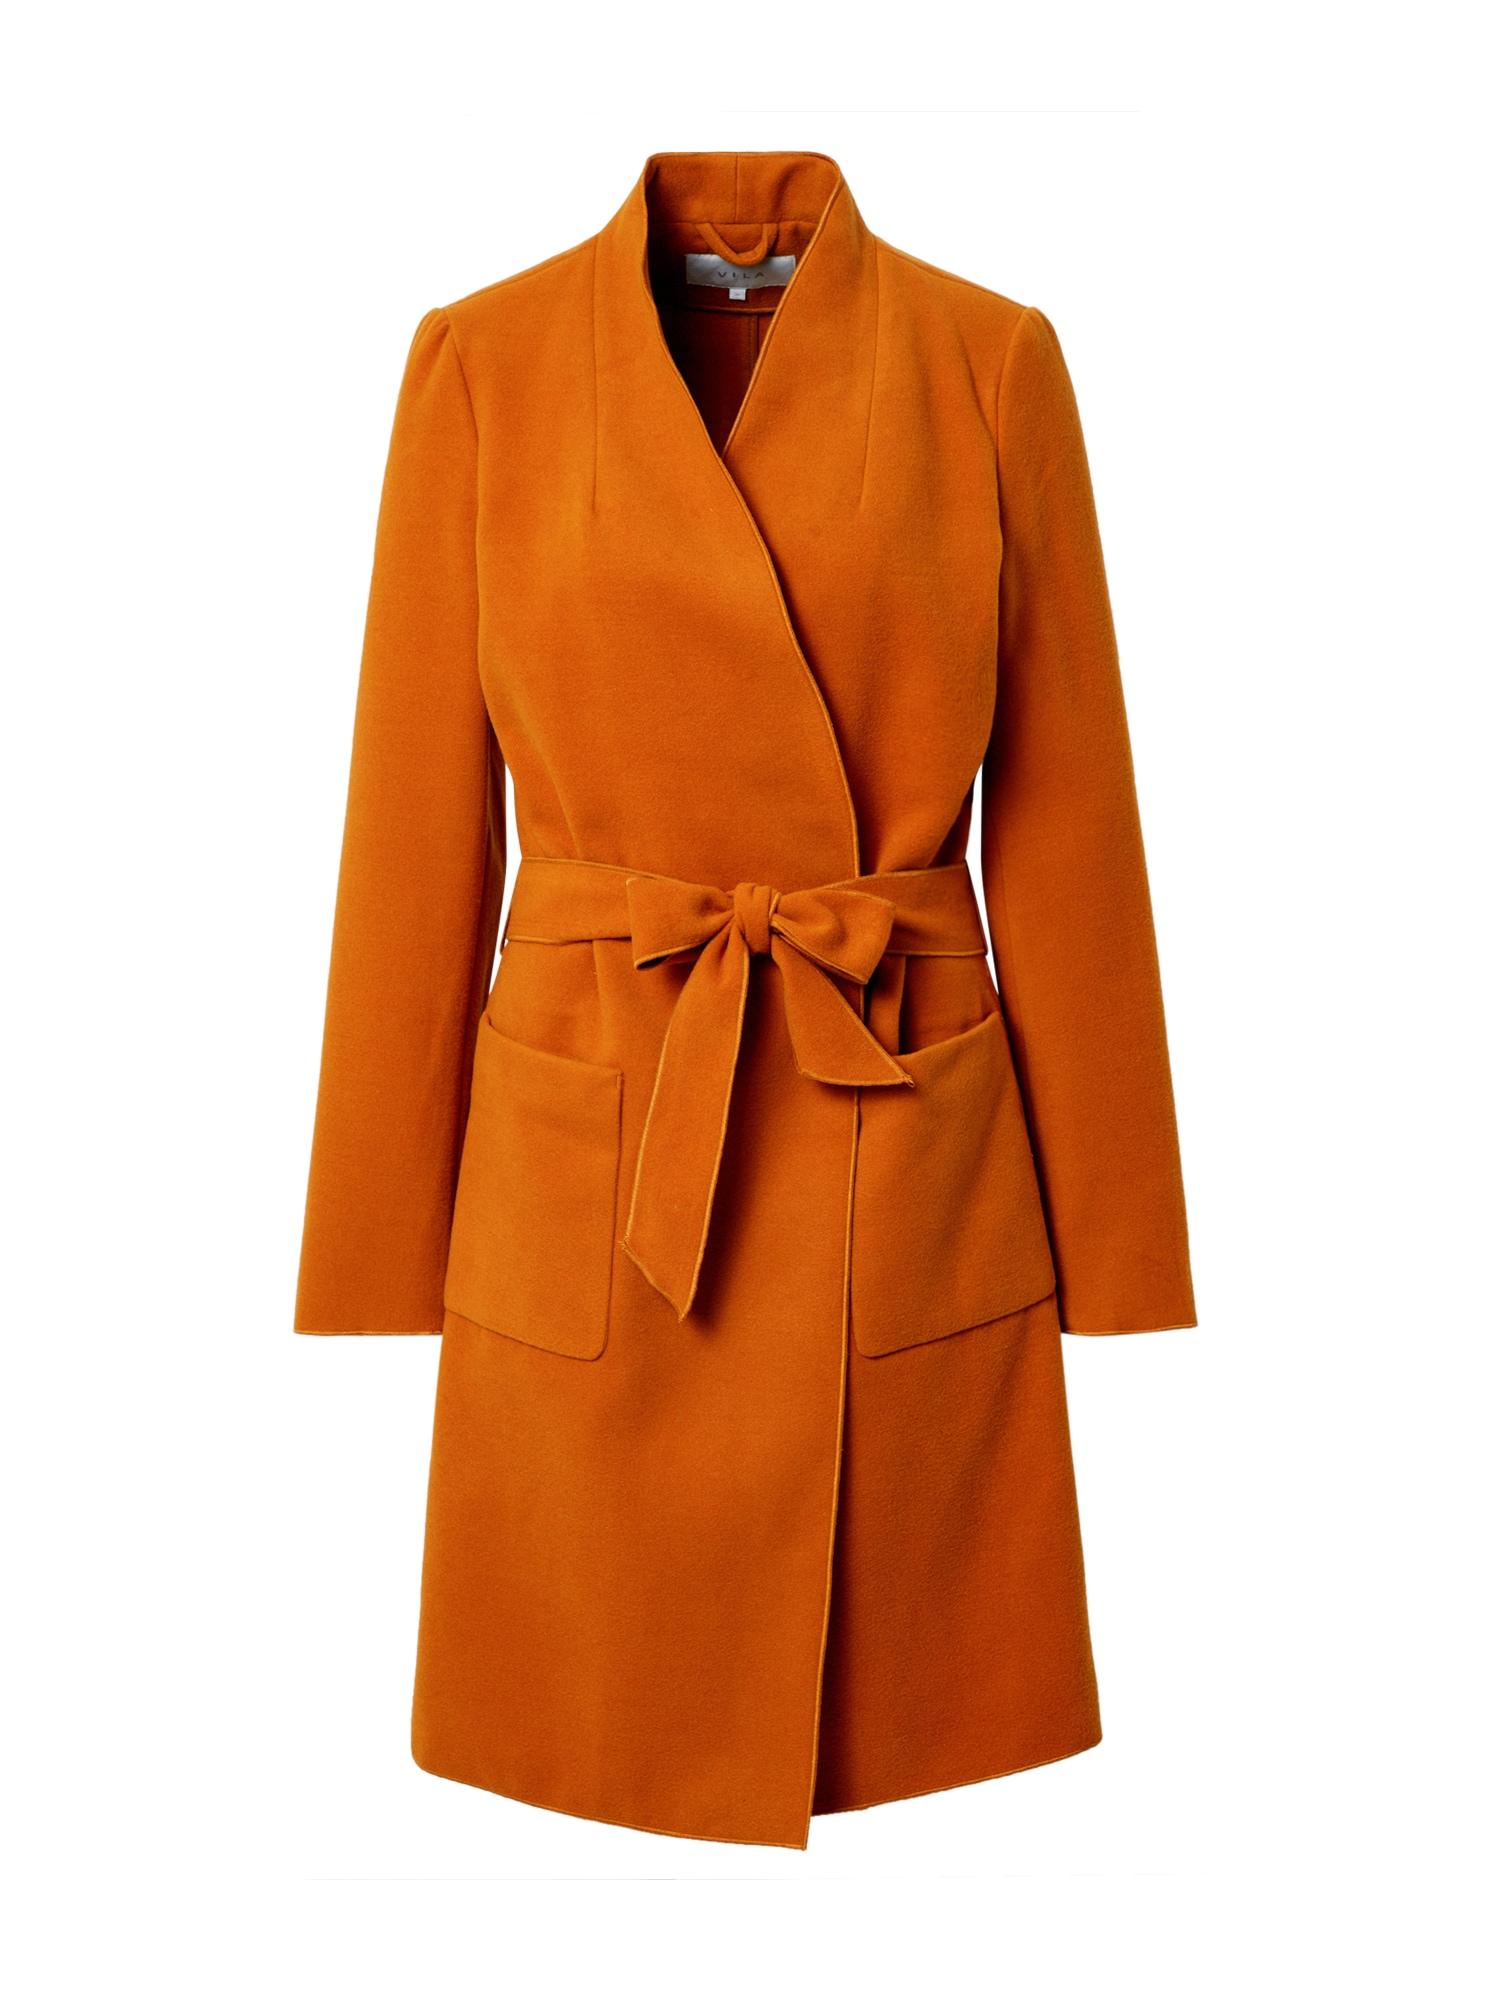 VILA Demisezoninis paltas oranžinė